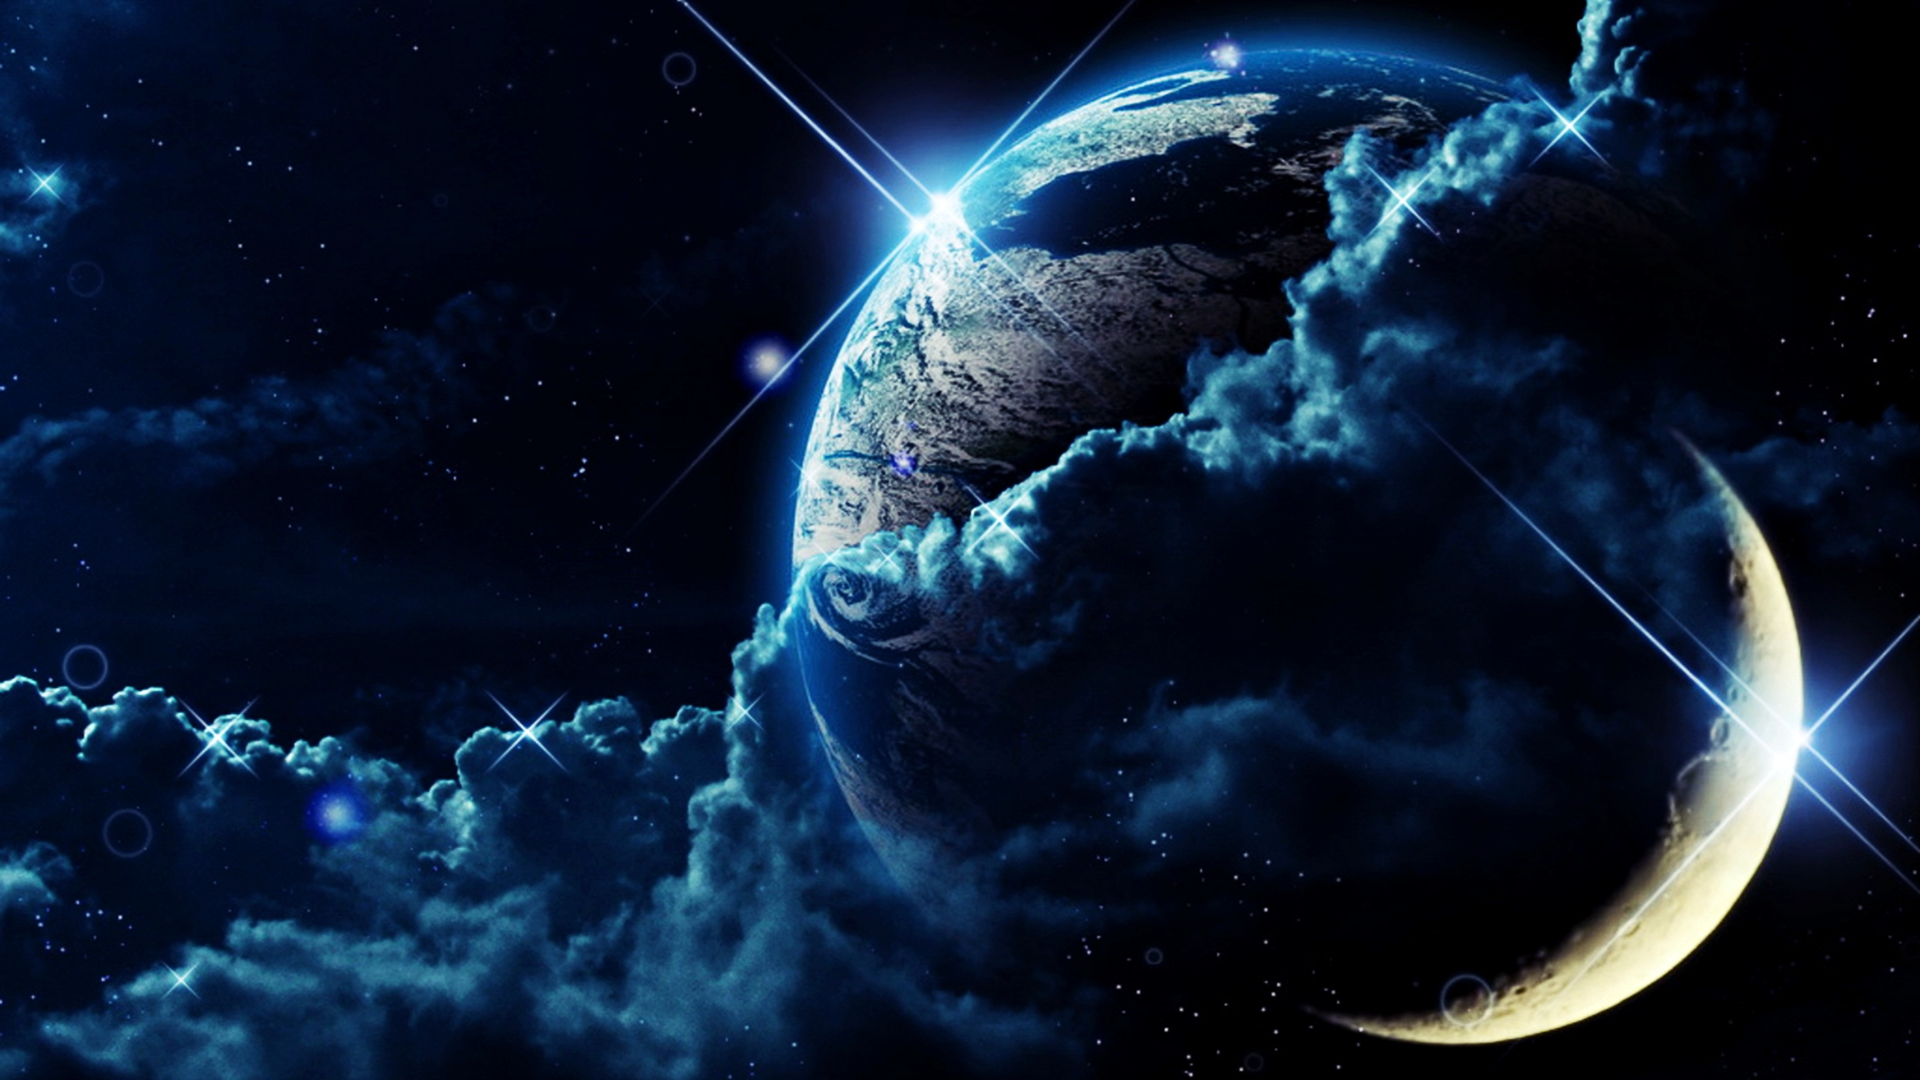 48 Earth Wallpaper Hd 1080p On Wallpapersafari